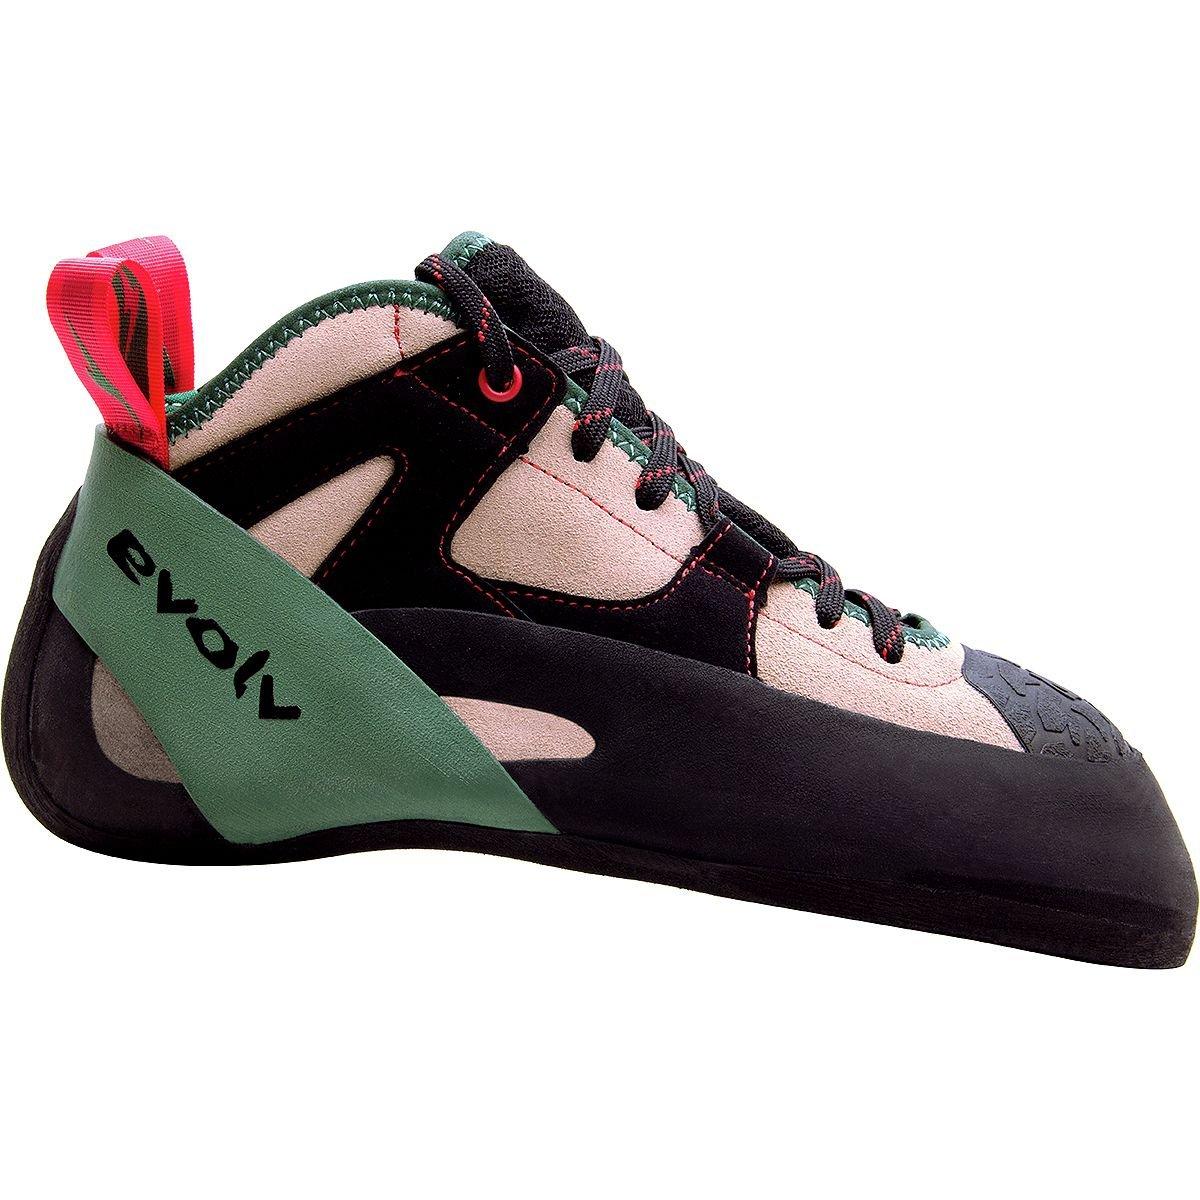 Скальные туфли Evolv General, tan/army green,